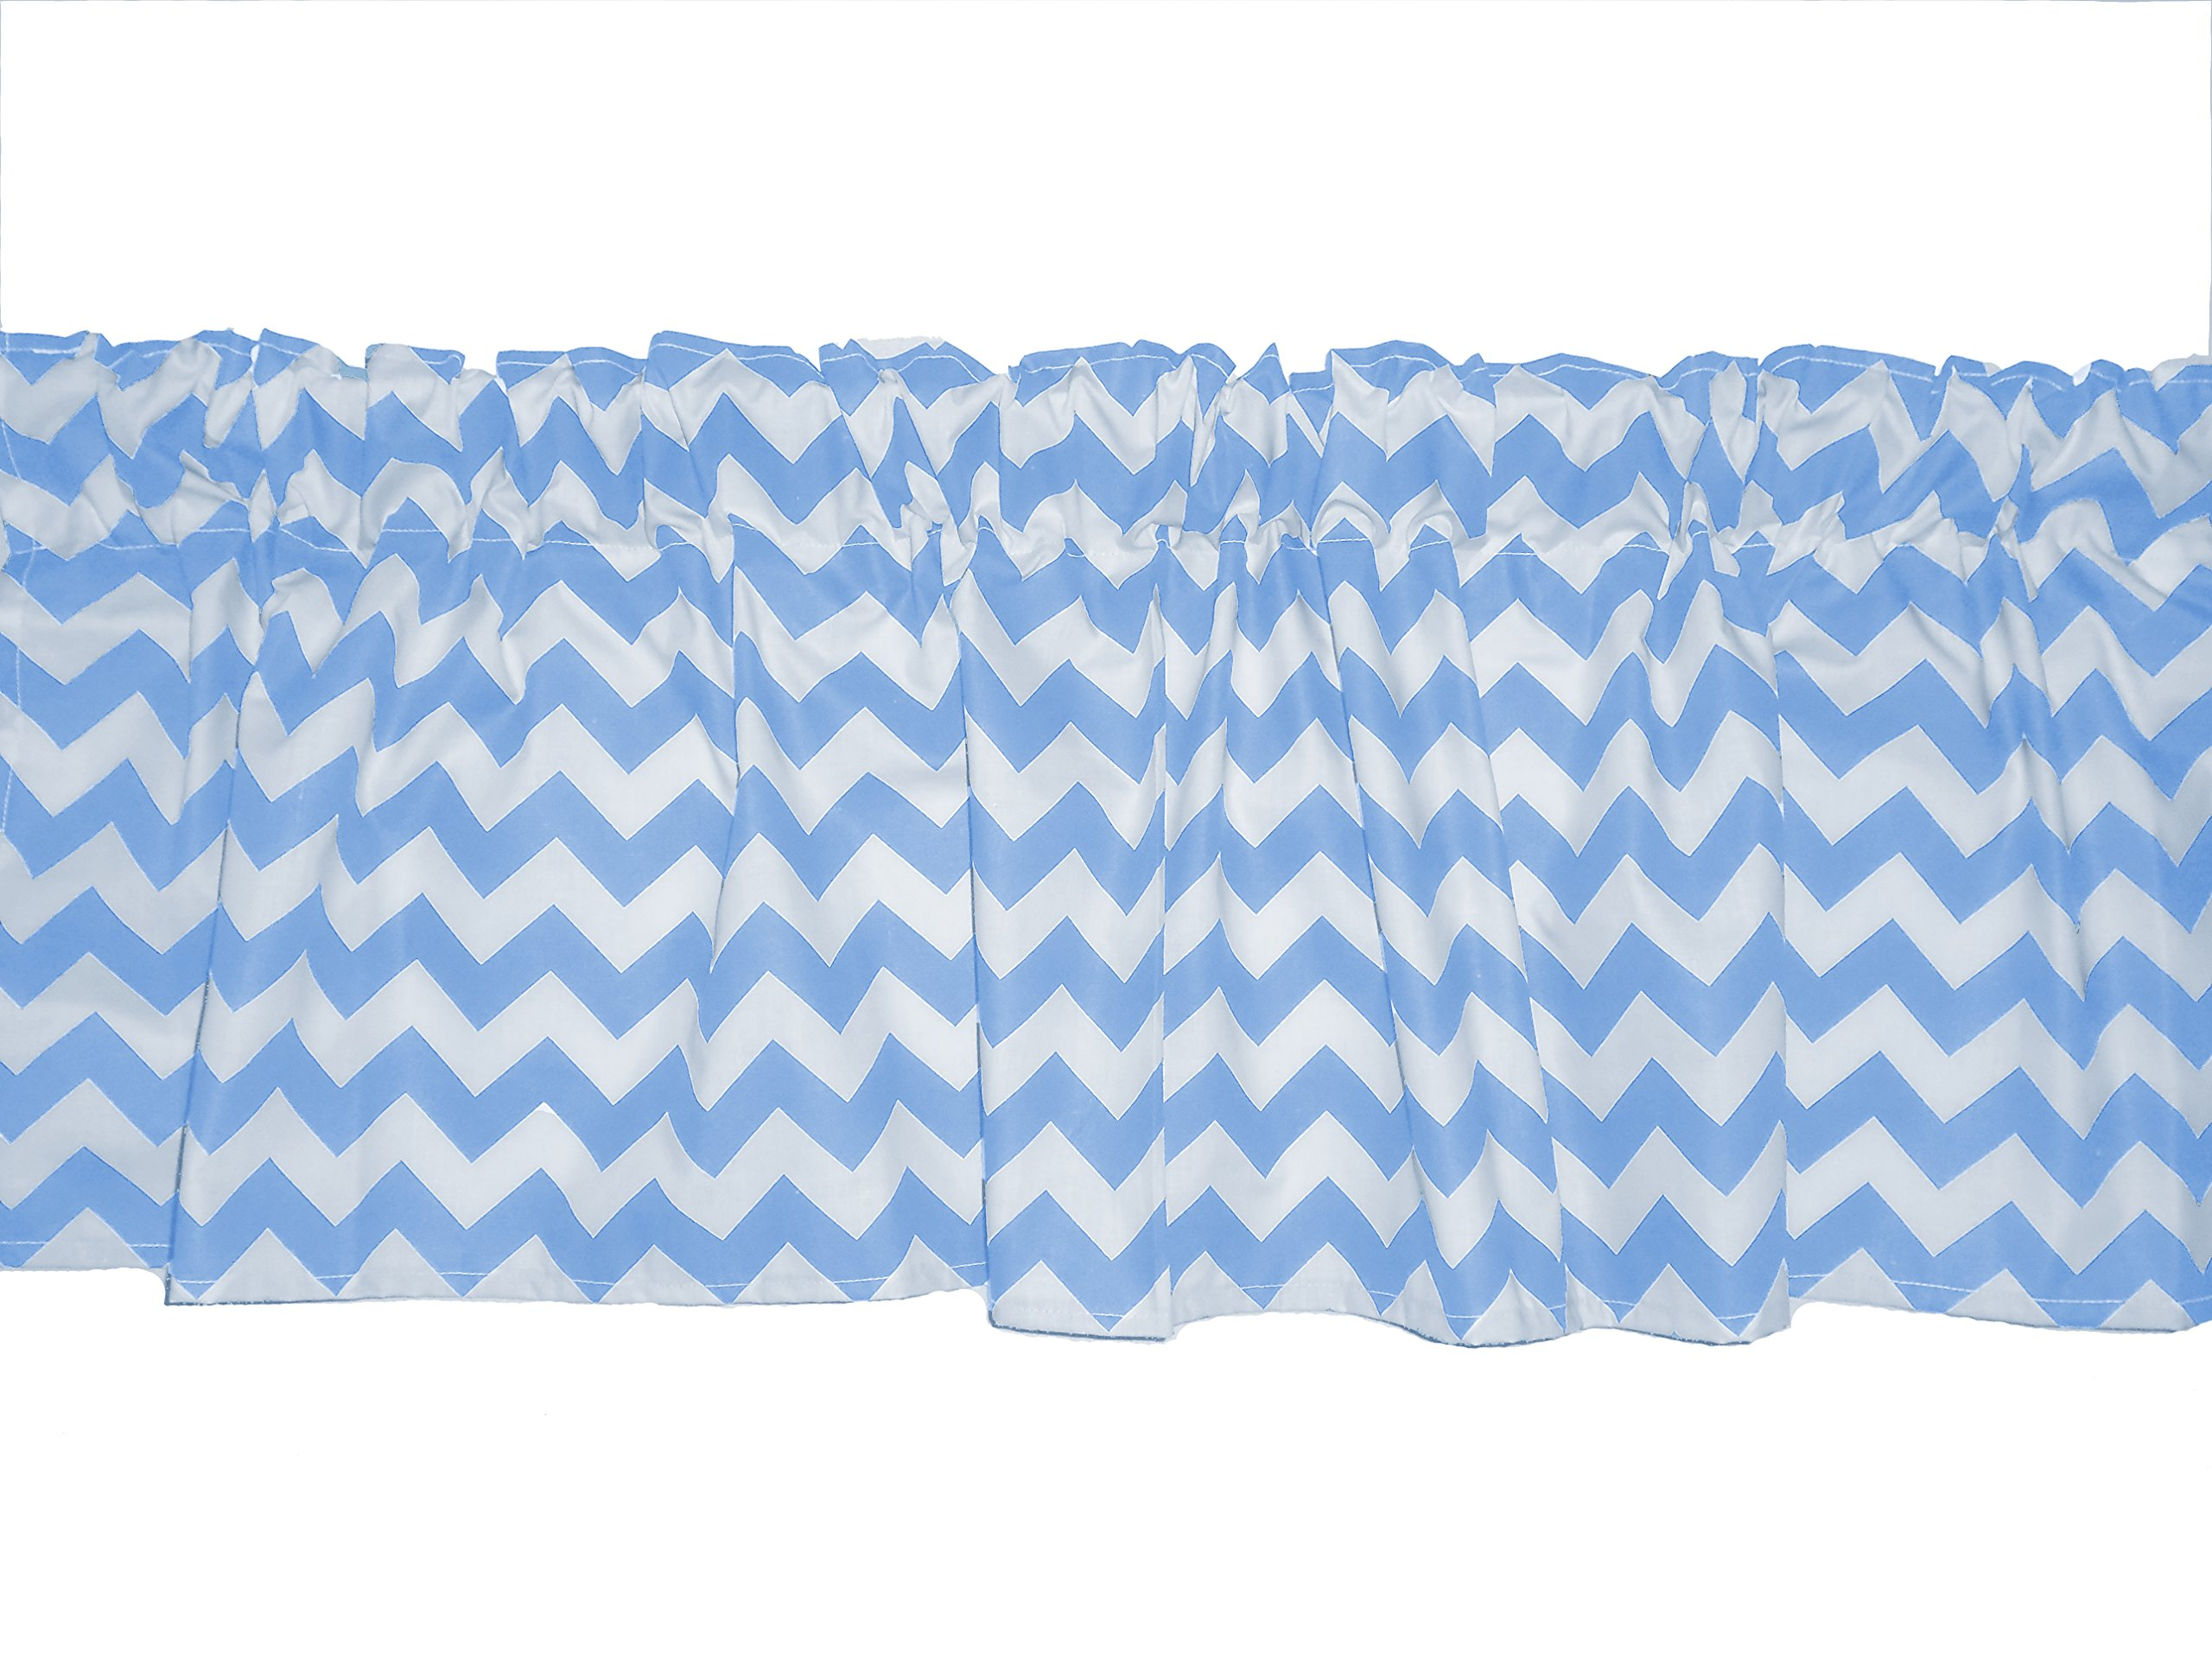 Baby Doll Bedding Chevron Window Valance, Blue by BabyDoll Bedding